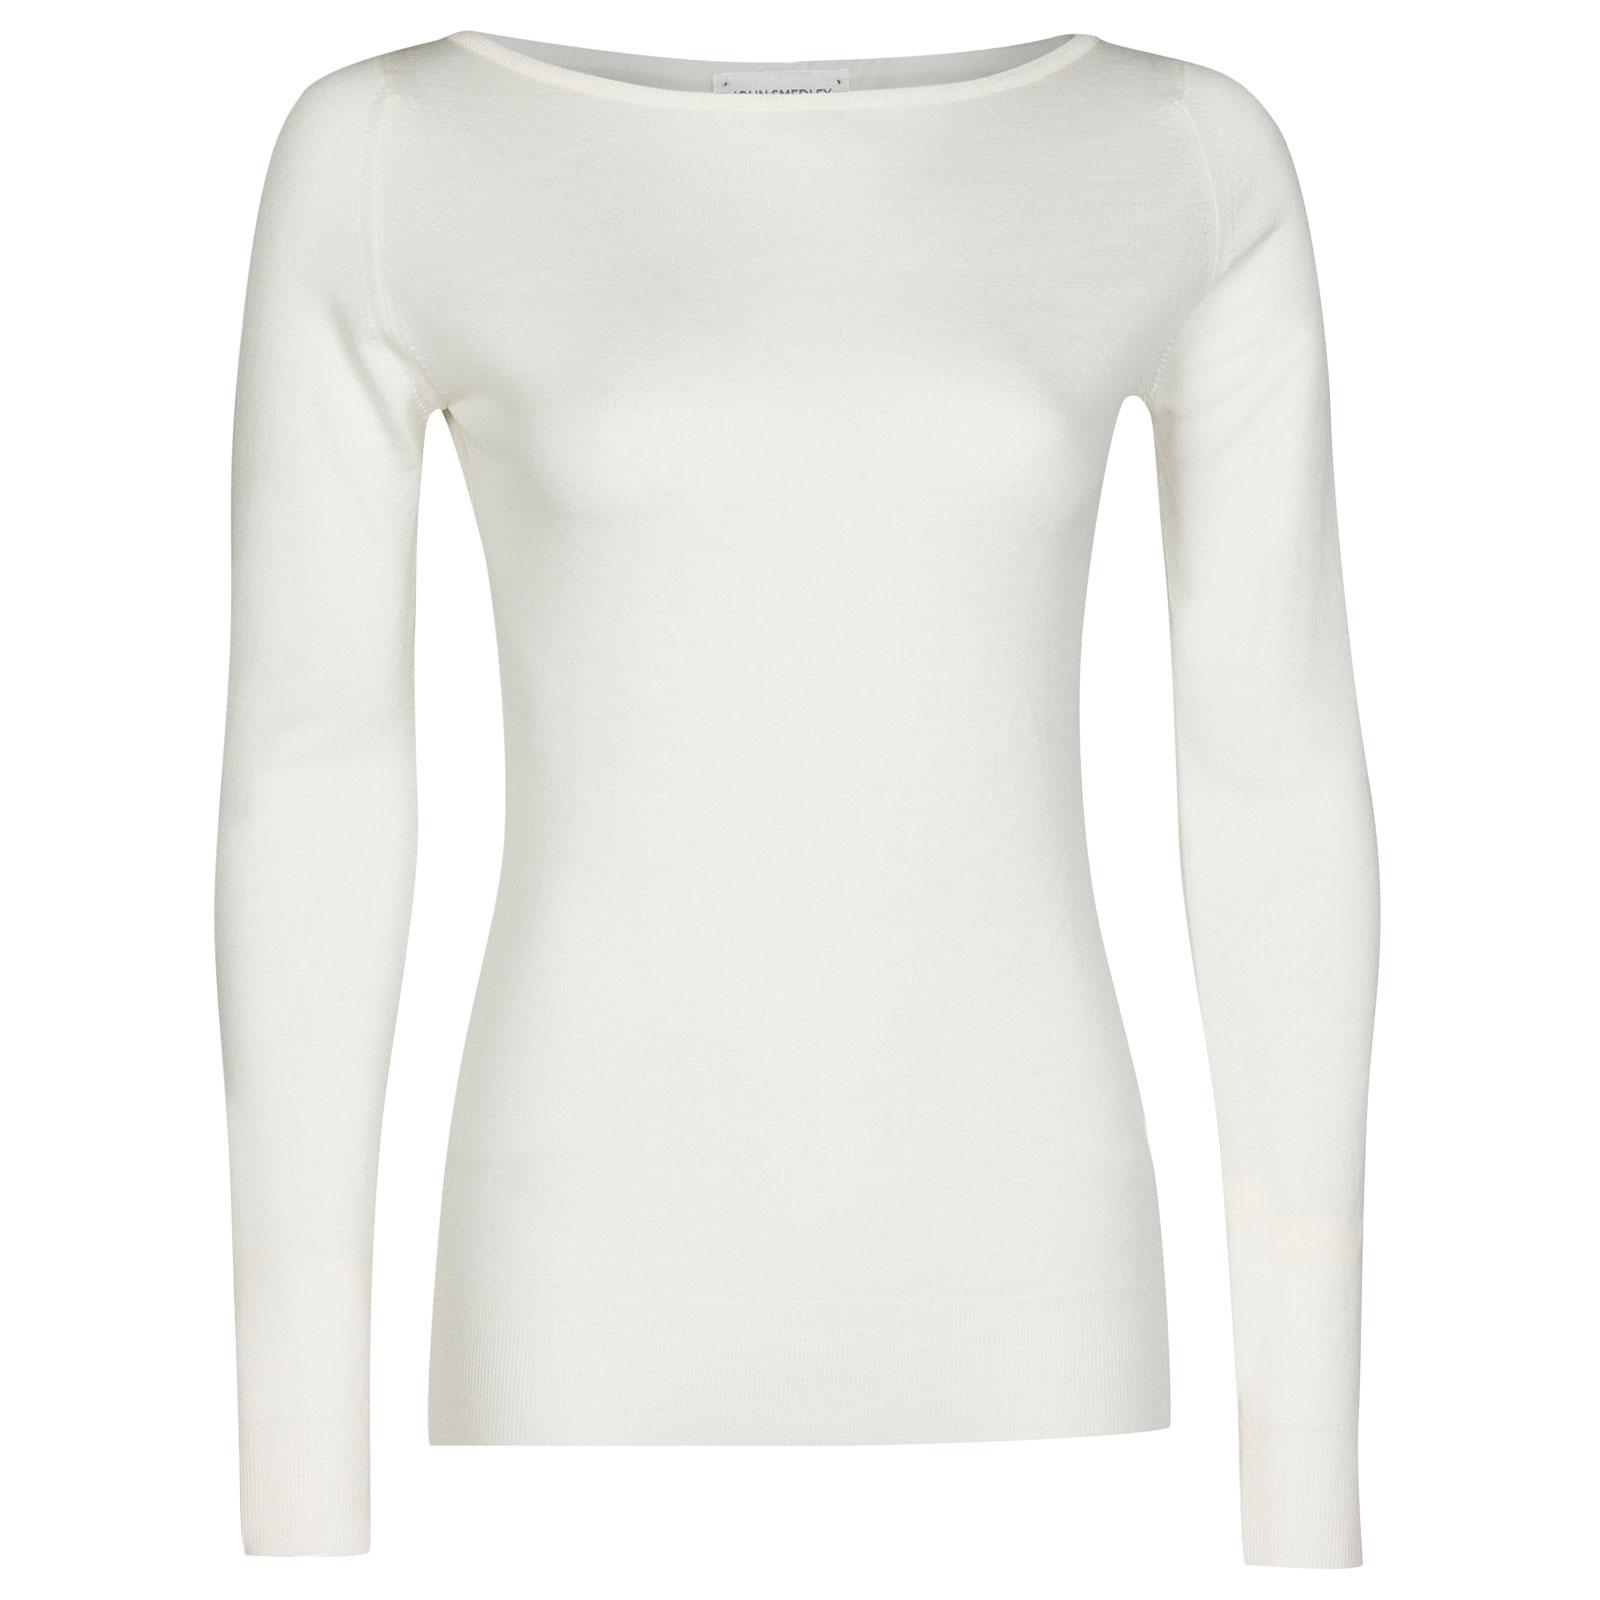 John Smedley Susan Merino Wool Sweater in Snow White-XL